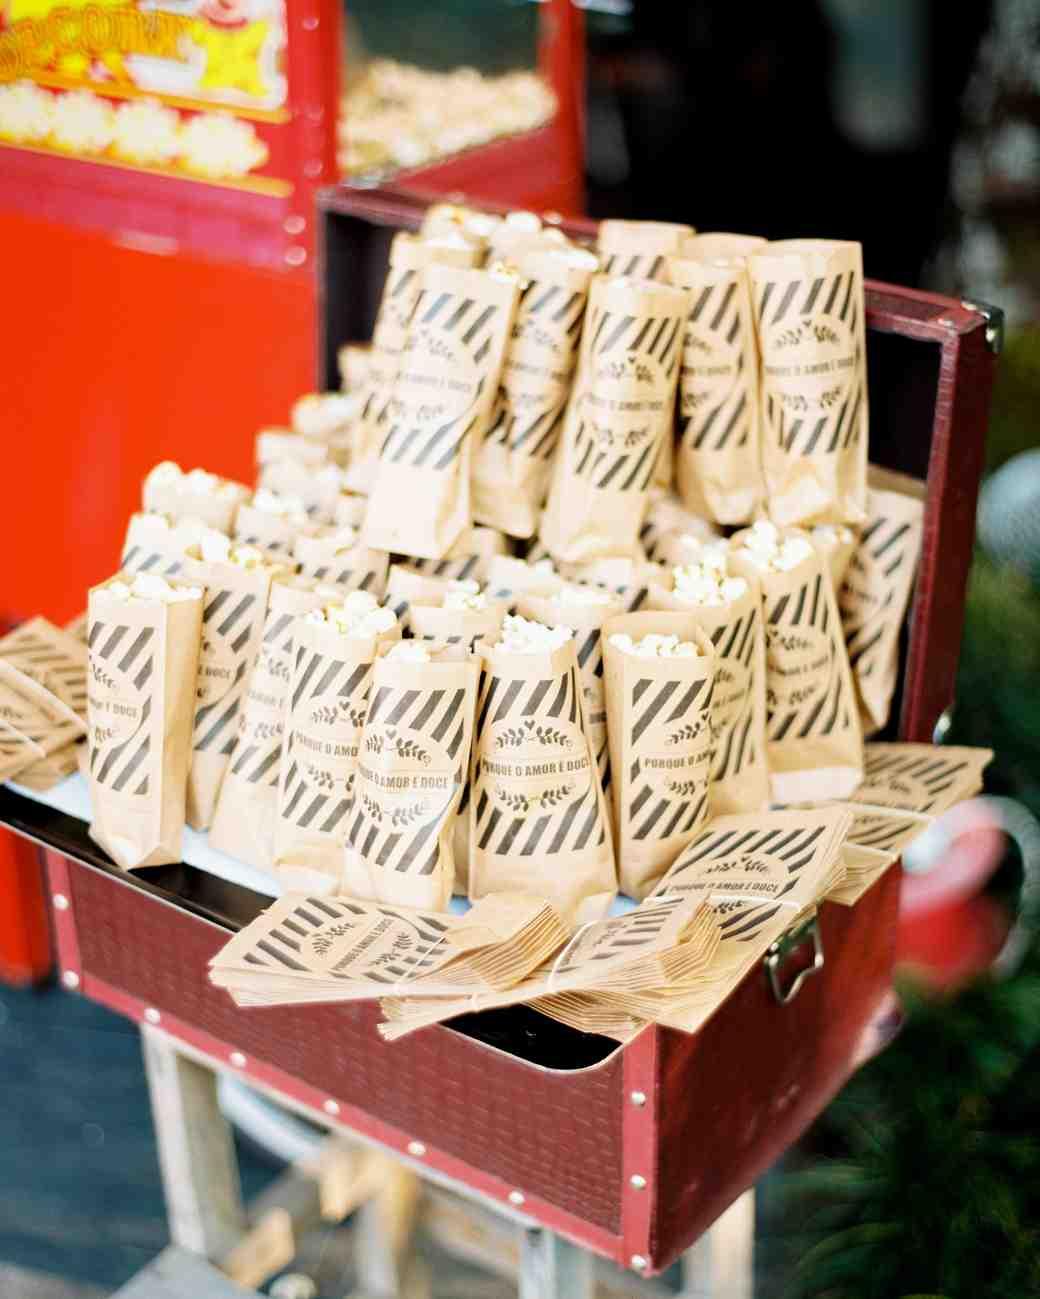 popcorn in baggies